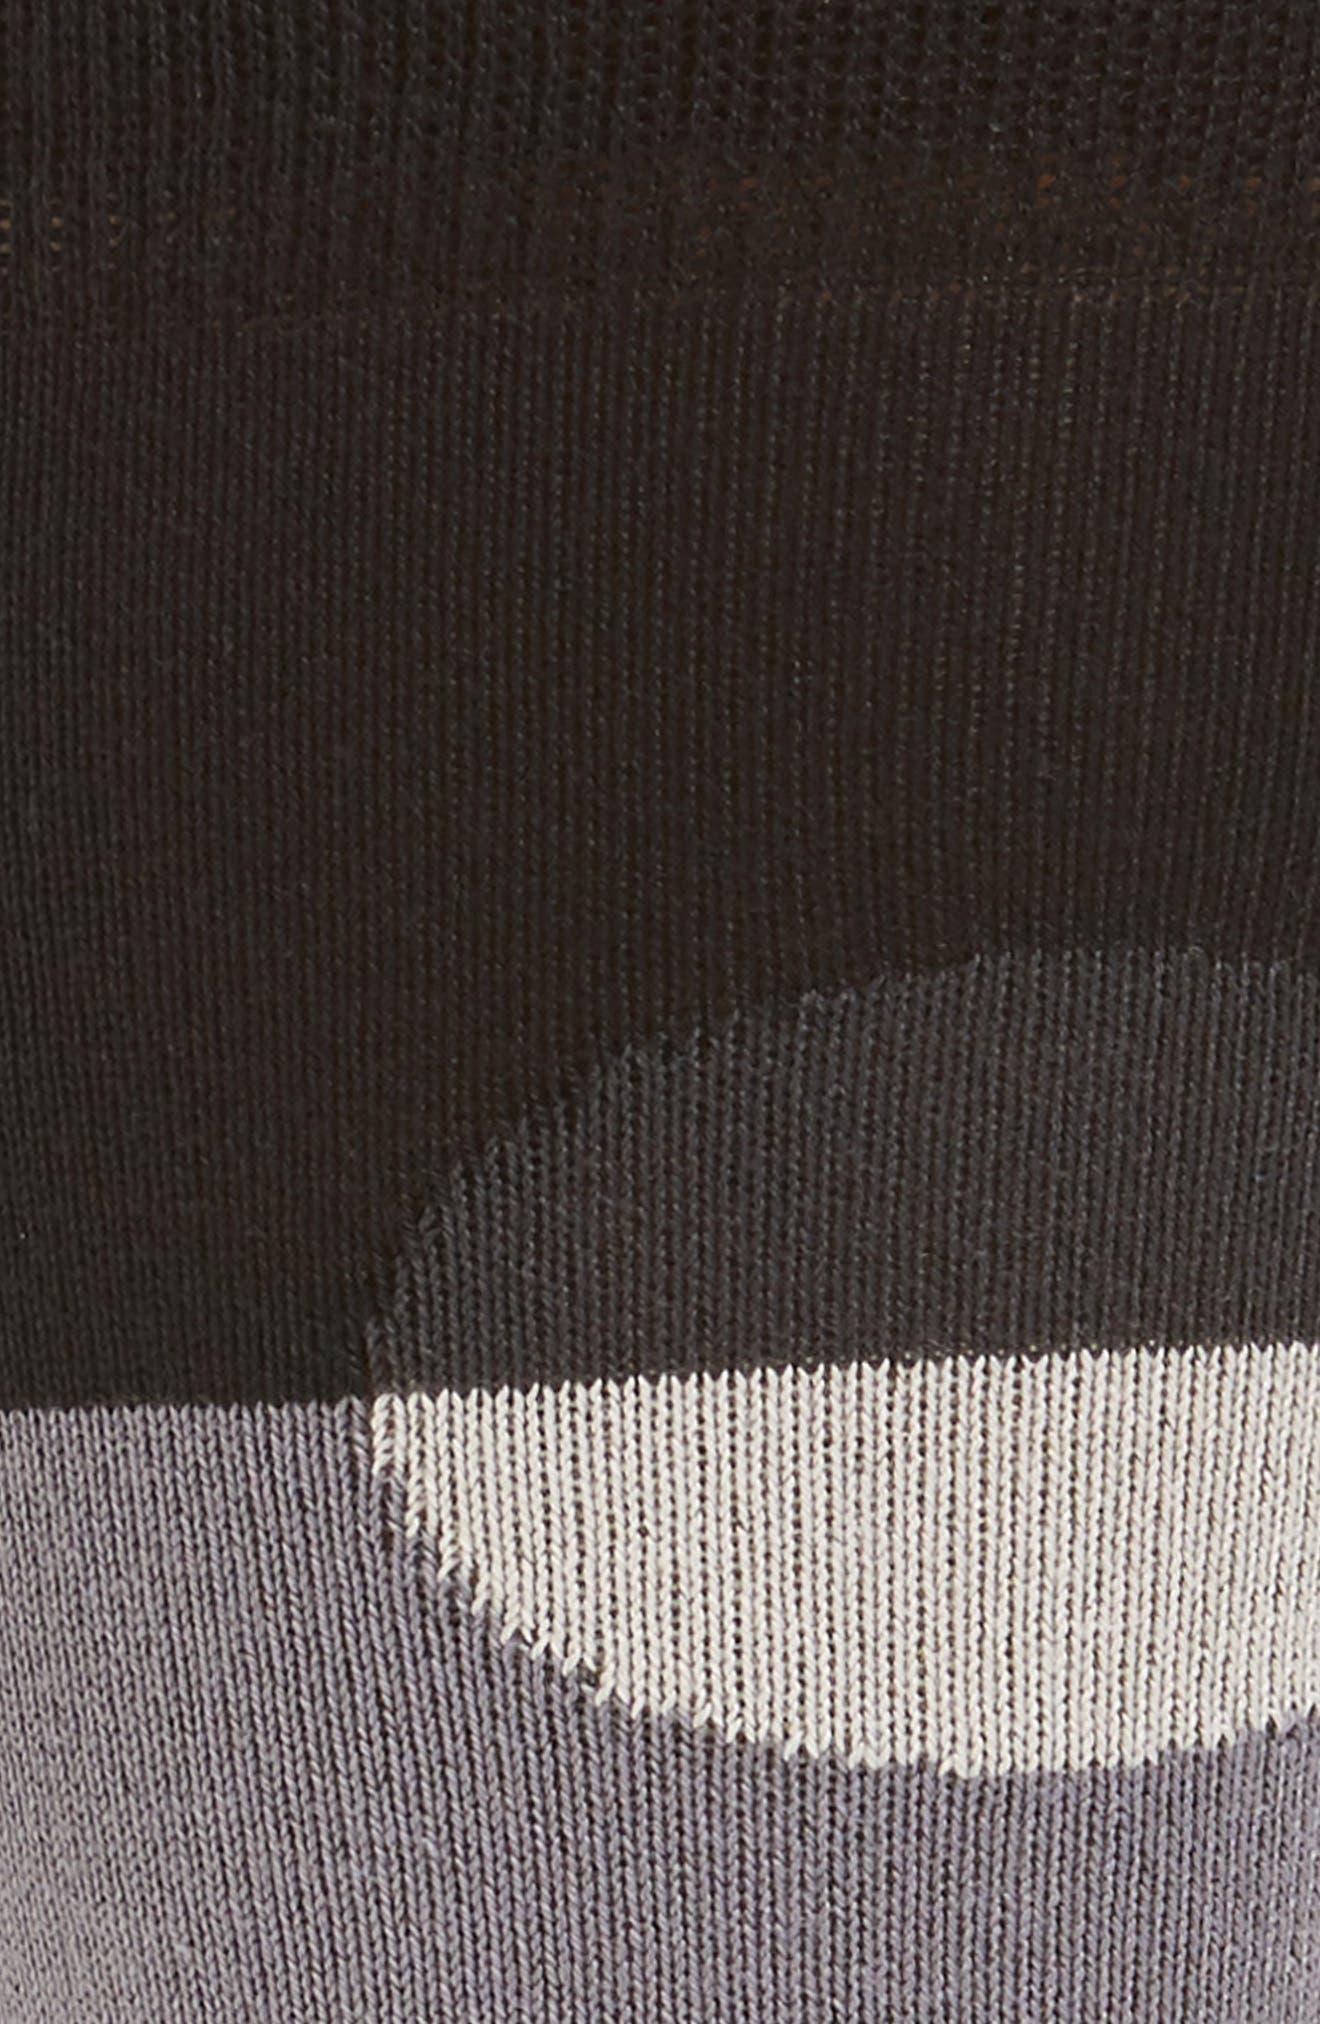 Crescent Dot Socks,                             Alternate thumbnail 2, color,                             Black